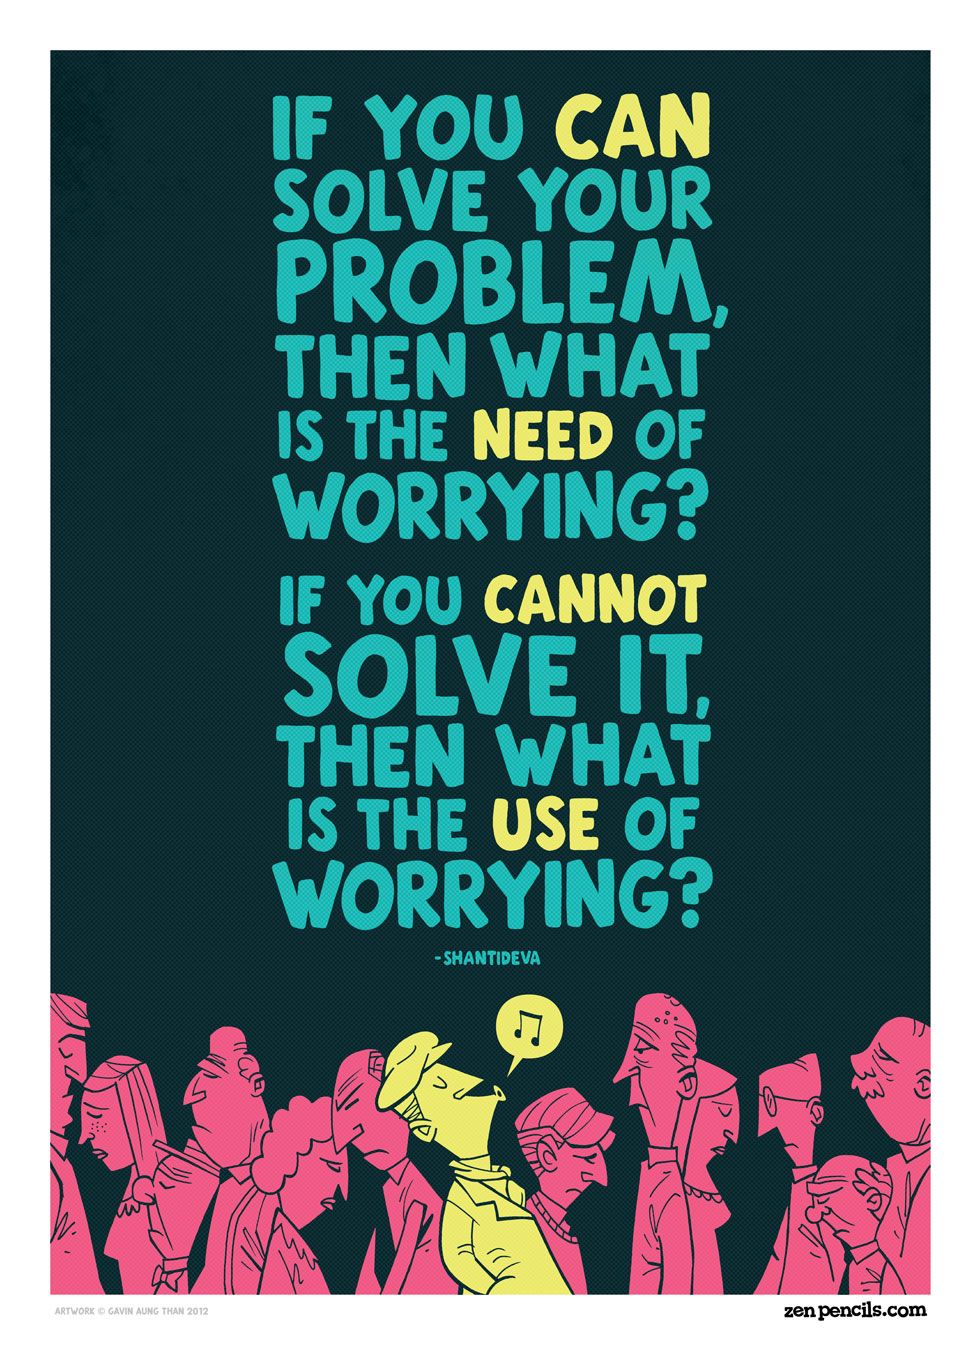 Never worry!